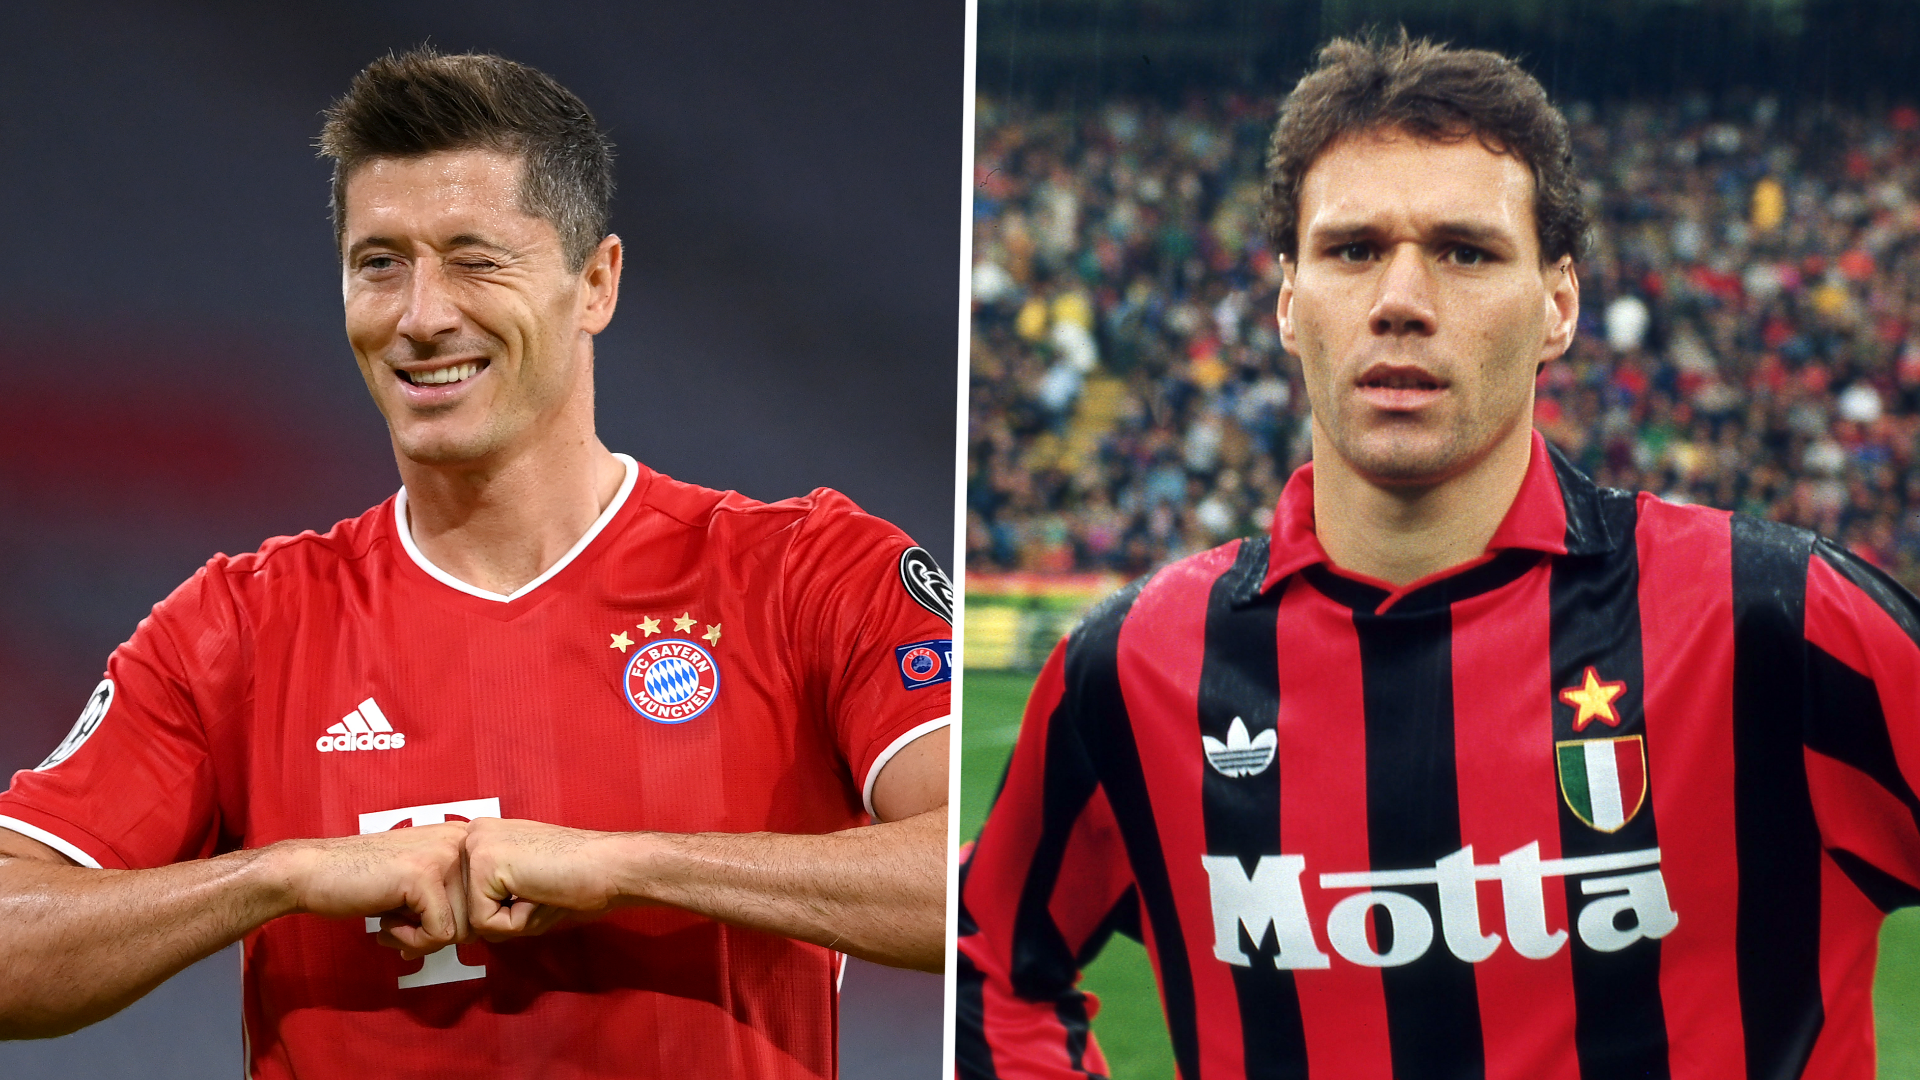 'Lewandowski the closest I've seen to Van Basten' - Ferdinand salutes Bayern star